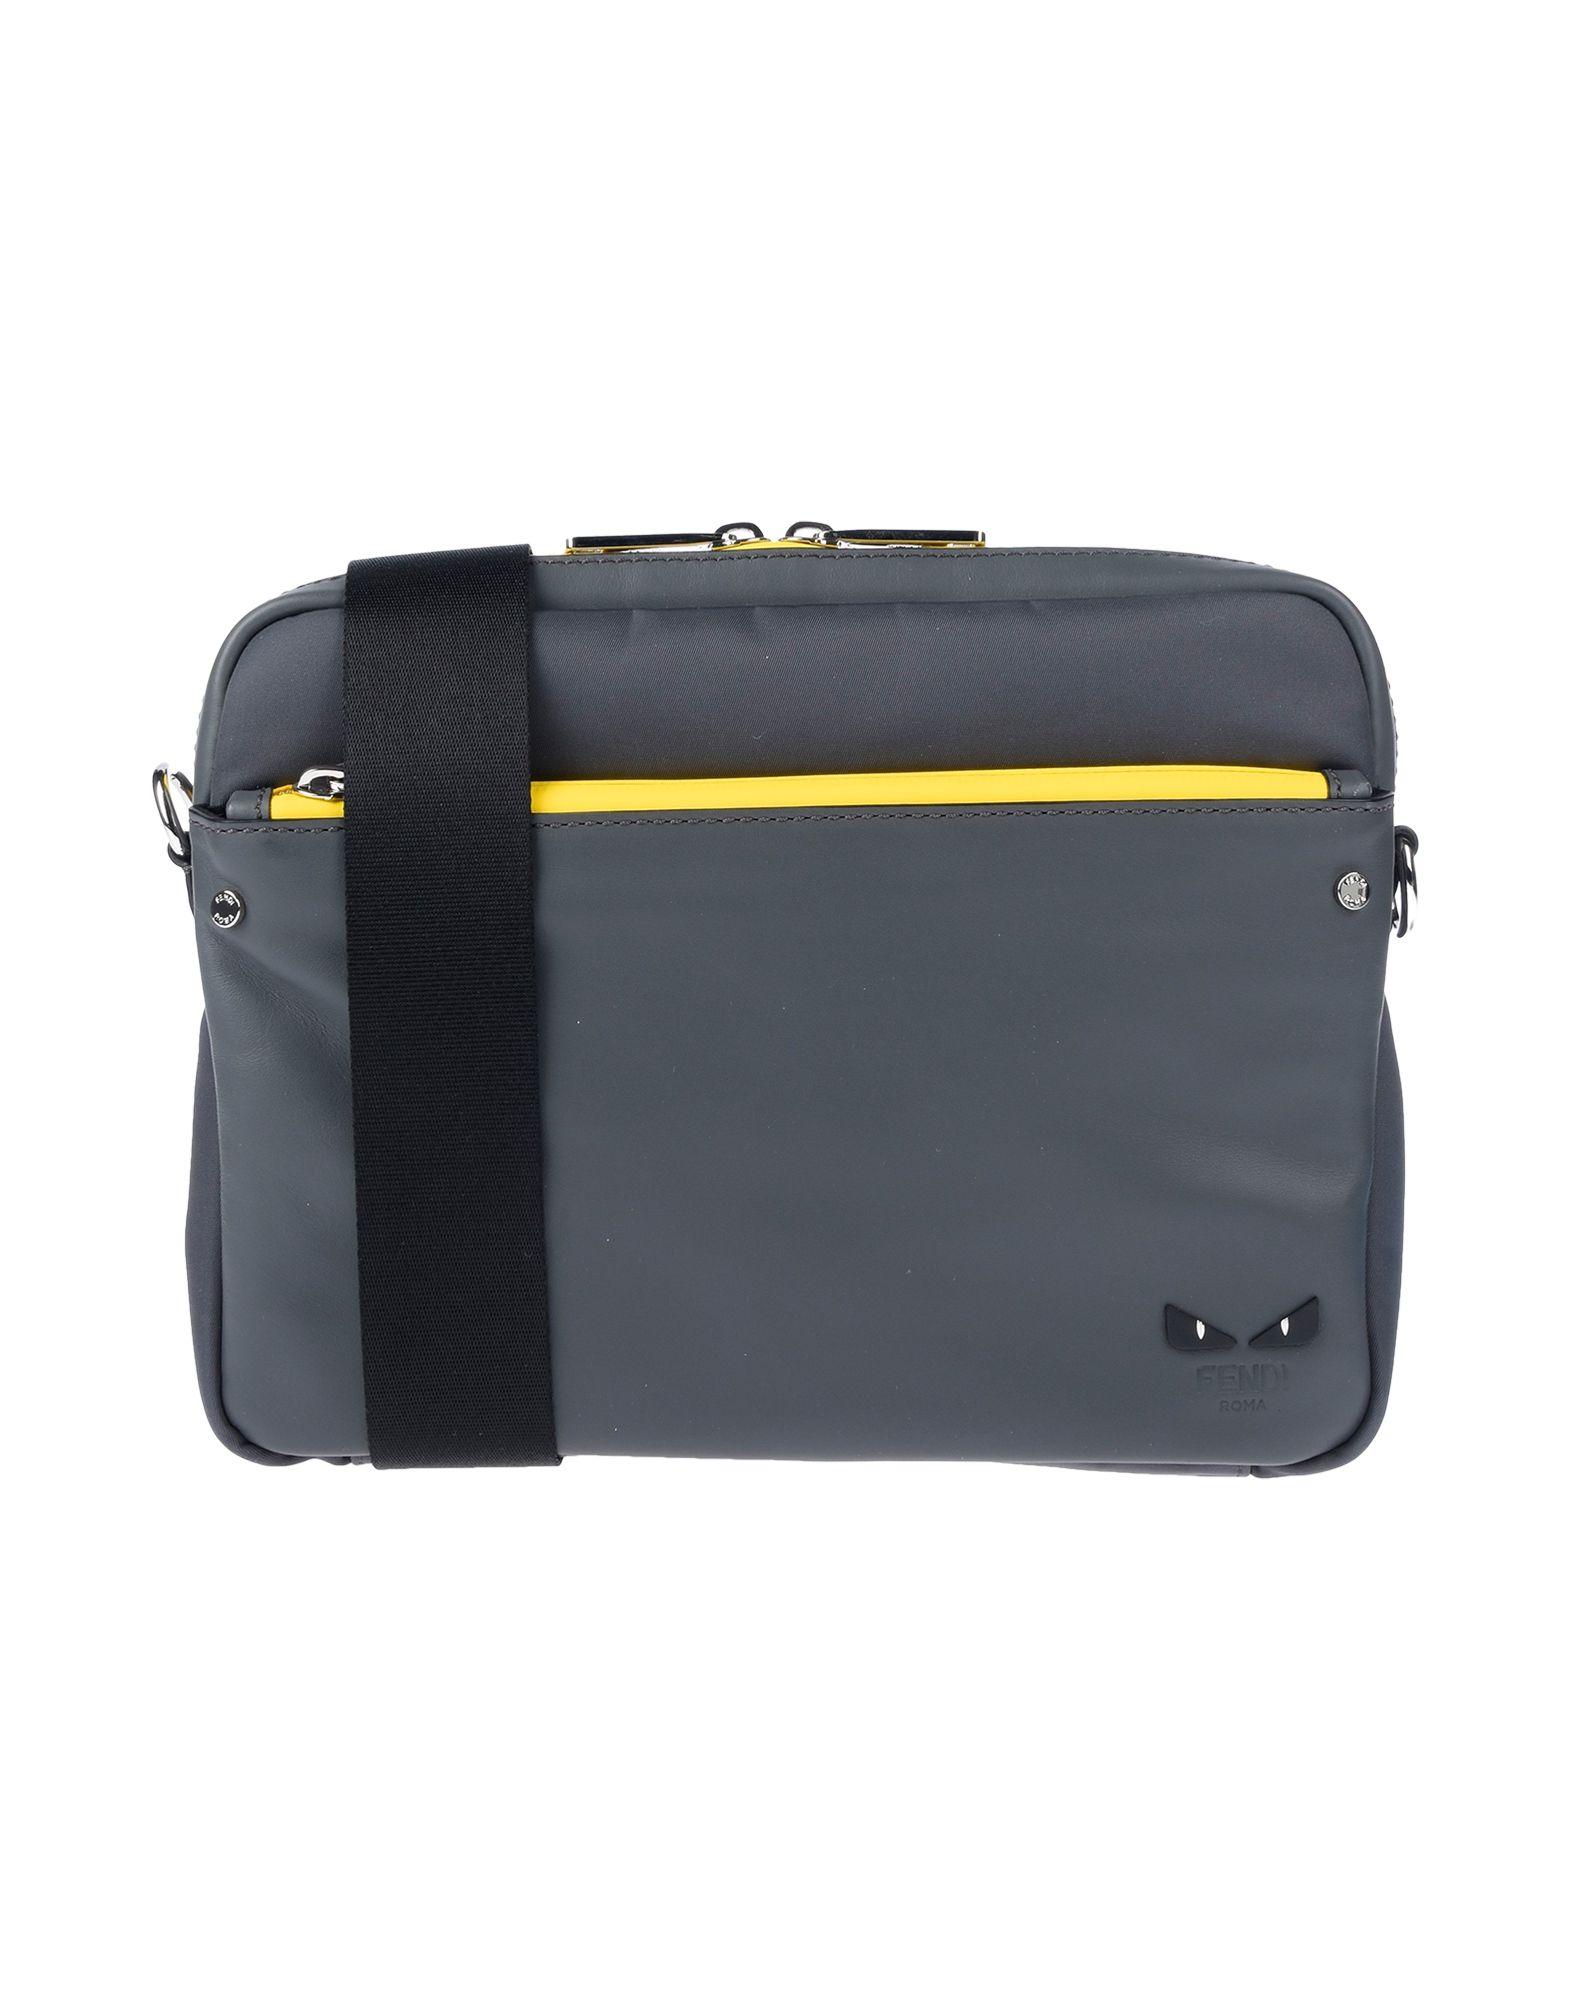 FENDI Сумка через плечо fendi серая сумка с серебристым логотипом kan i